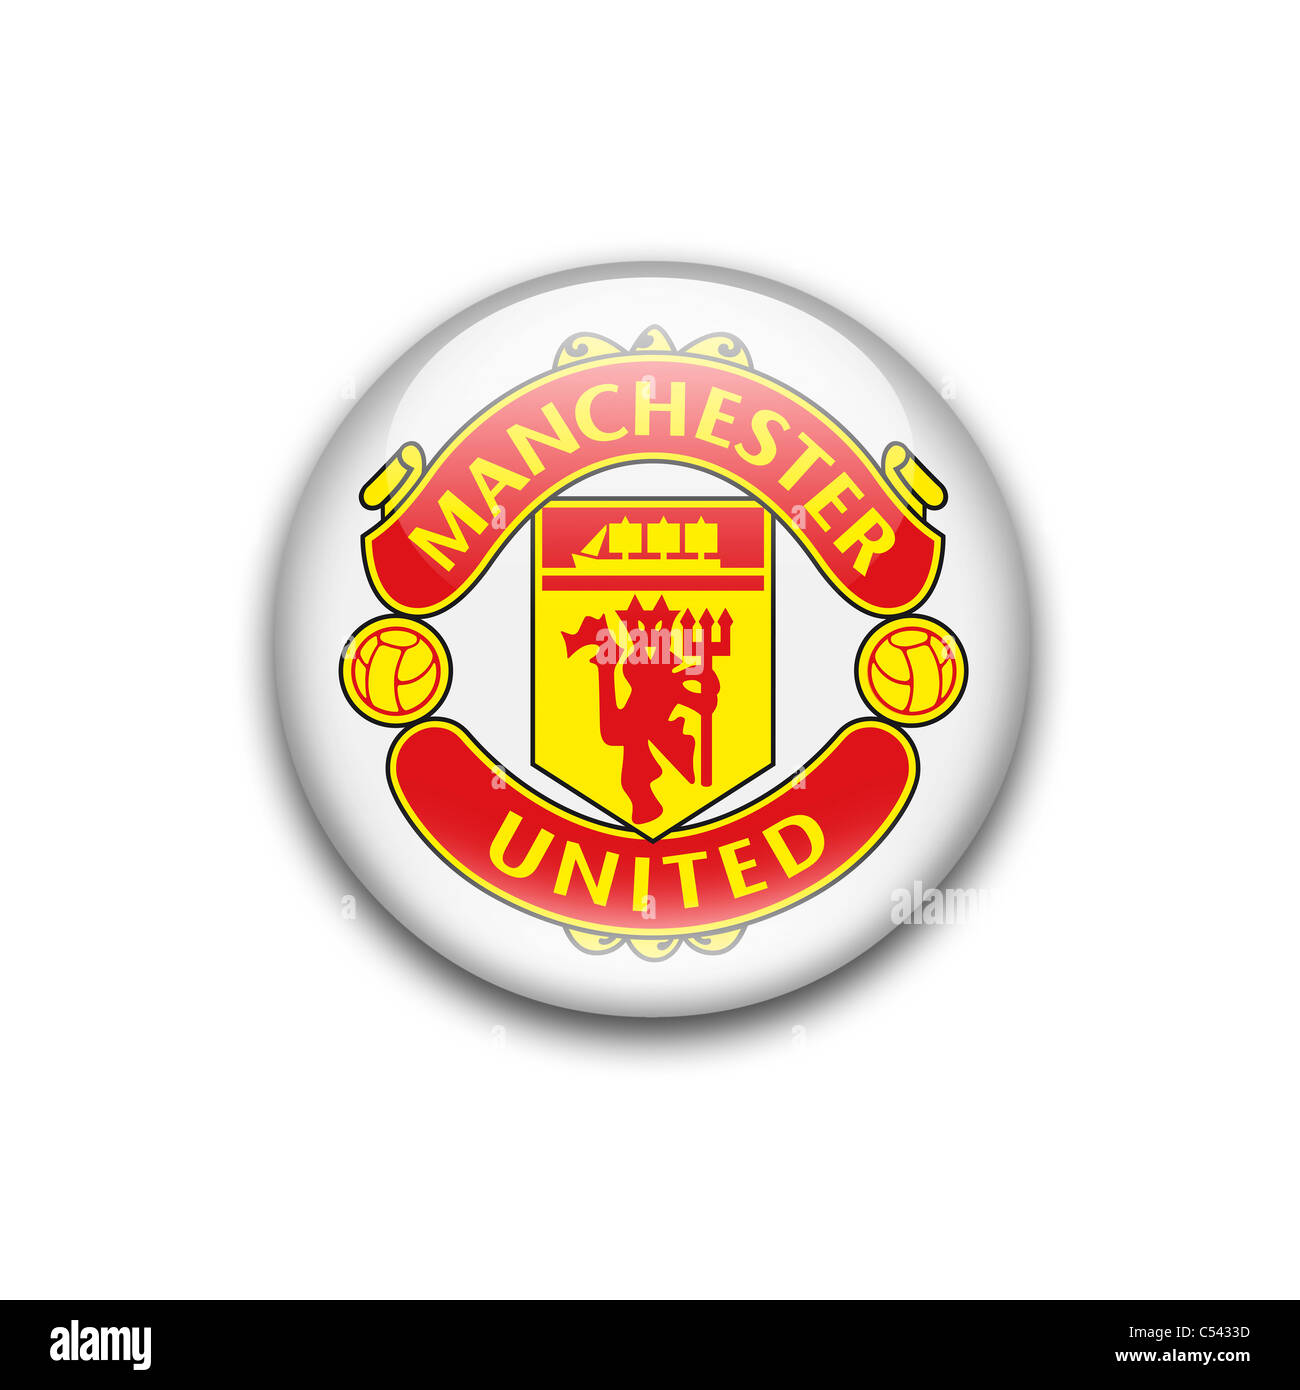 Manchester united flag logo symbol icon stock photo 37584273 alamy manchester united flag logo symbol icon voltagebd Images